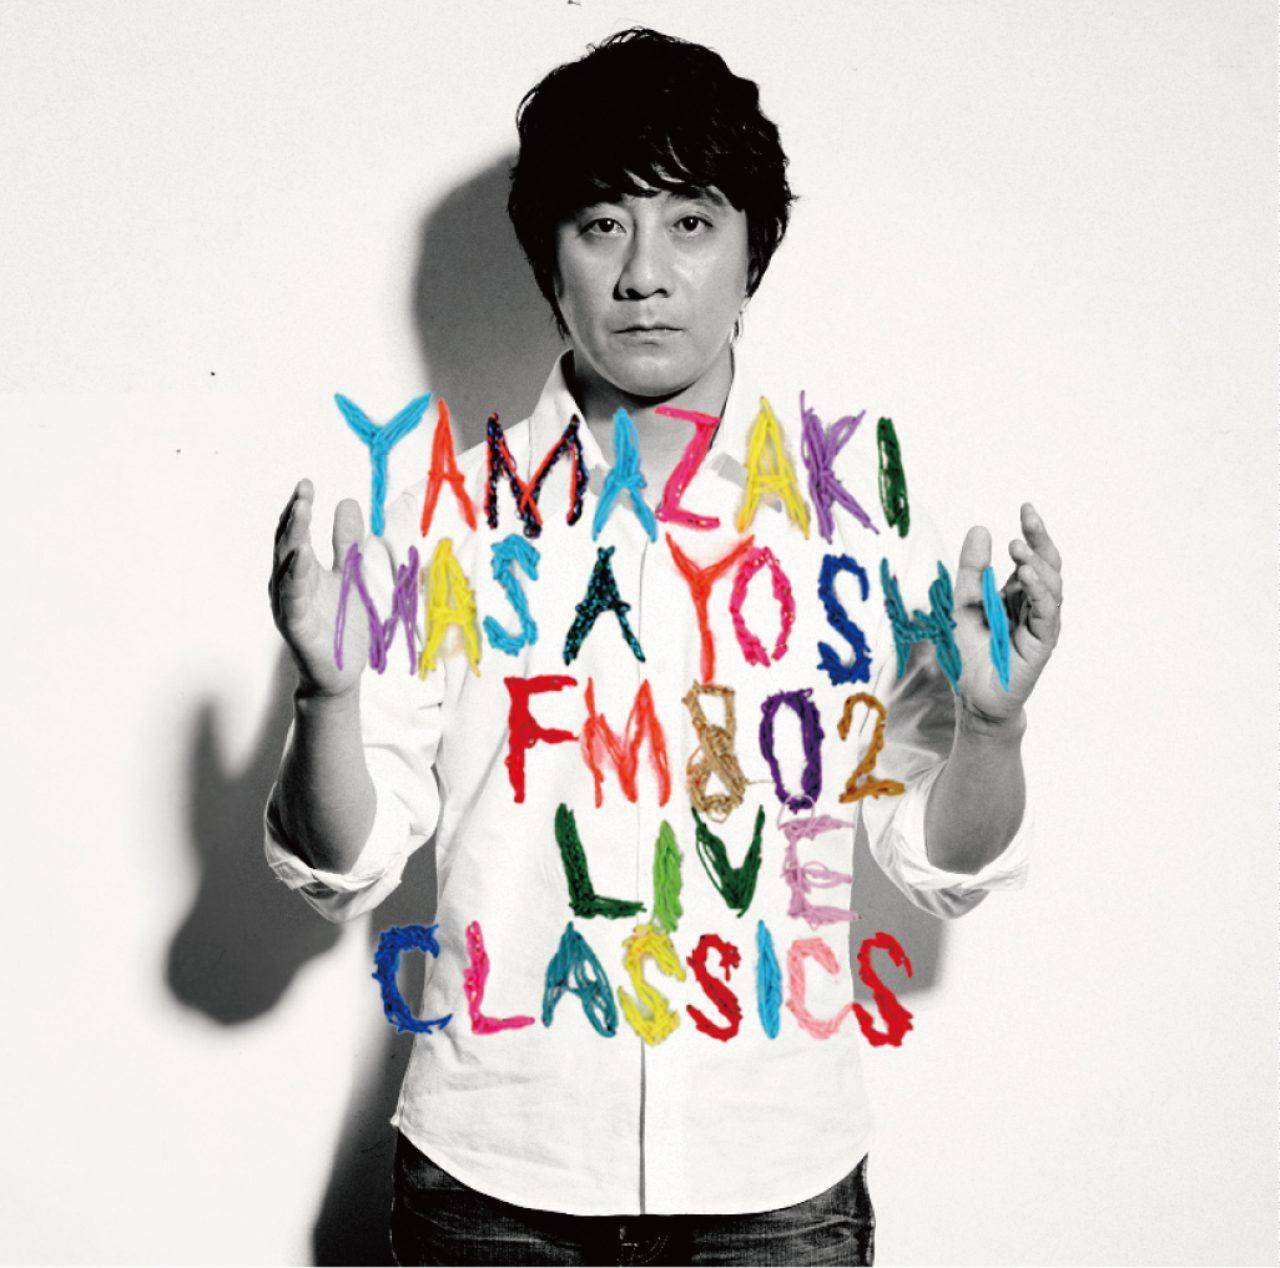 画像: [J-POP ALBUM]Augument Records 発売中 2500円(税込